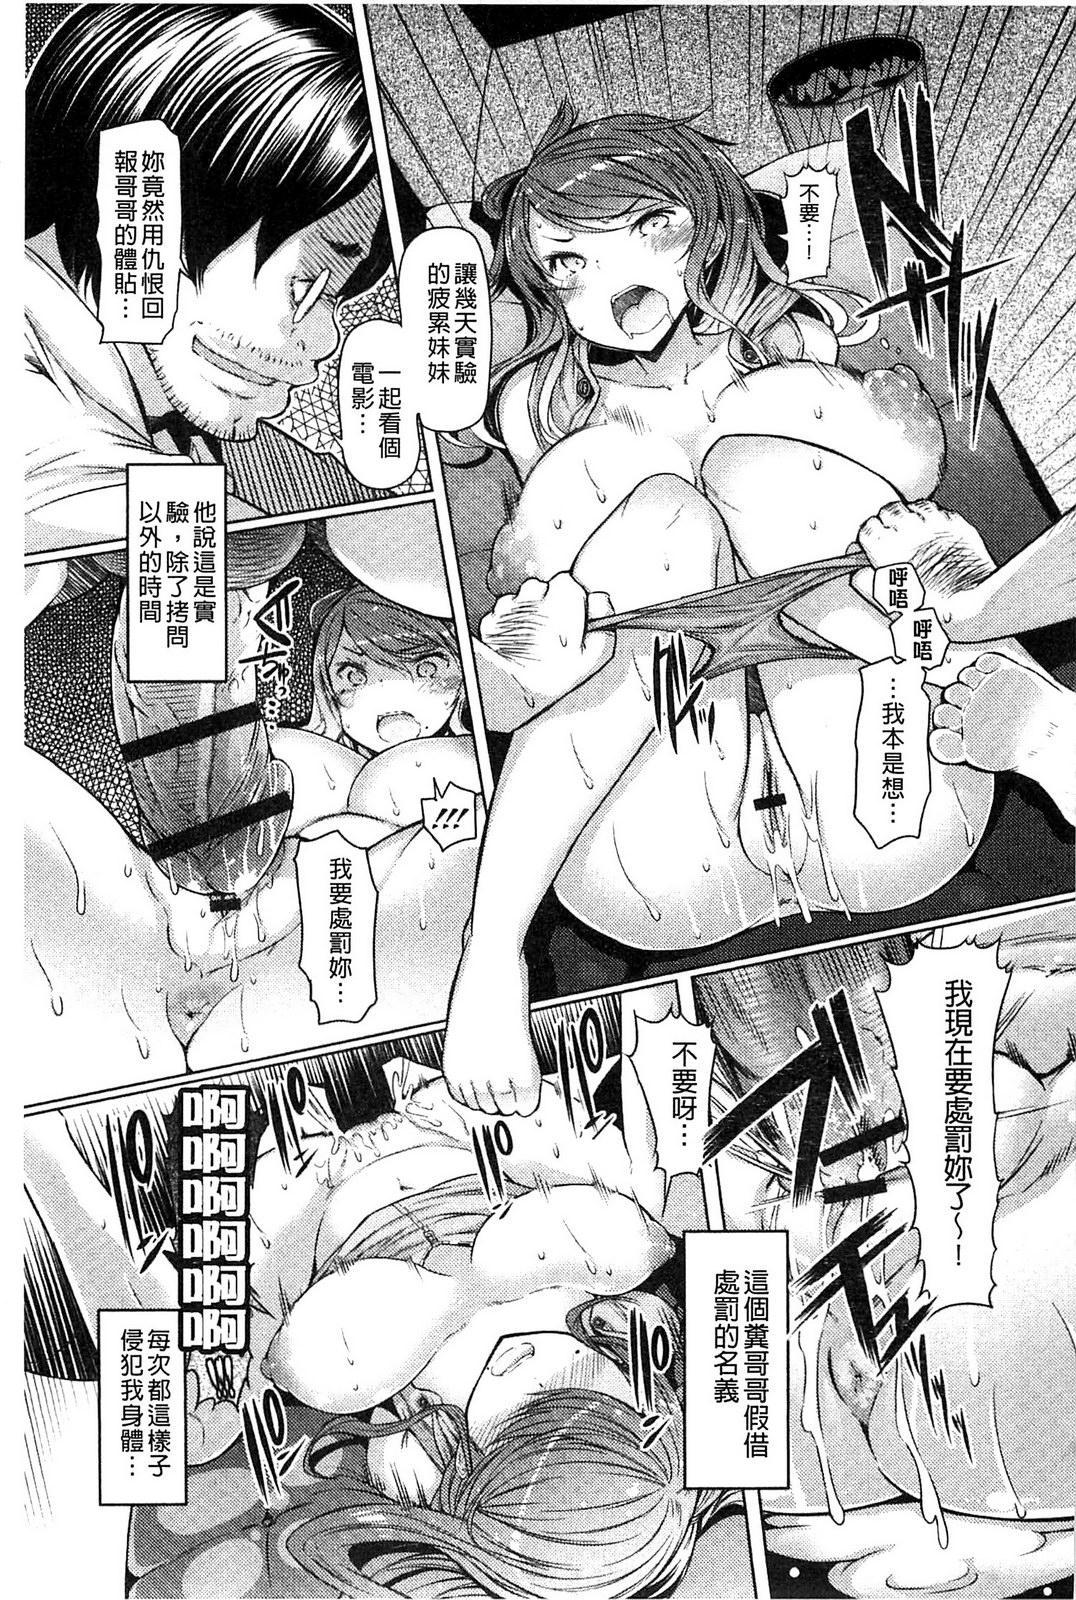 Imouto Kansatsu Nikki - The Record of Sex with My Sister 27